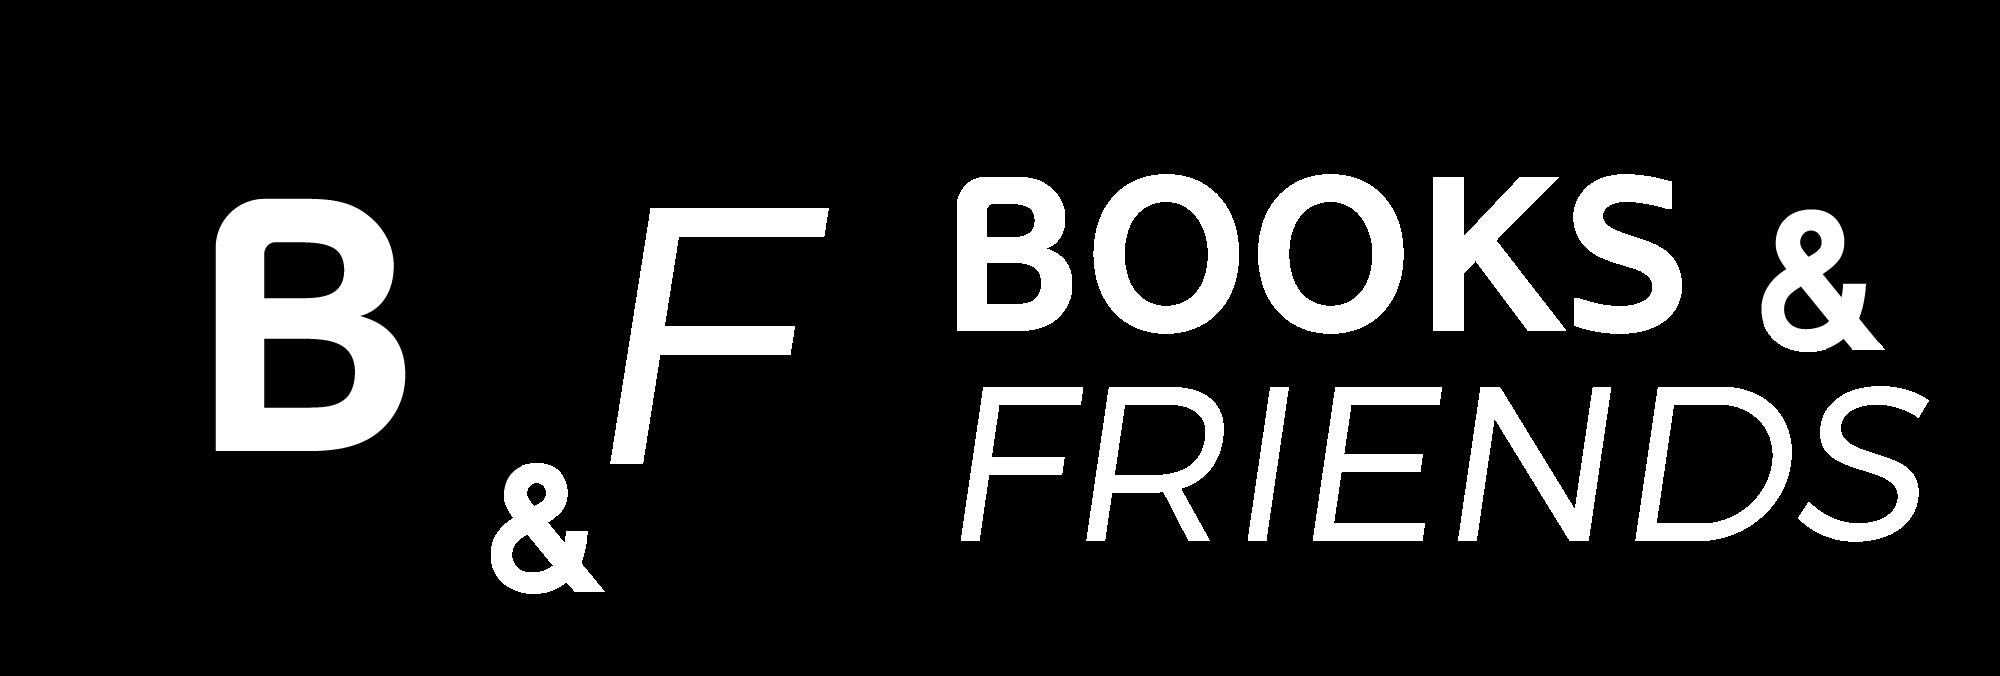 Bookfriendsofficial24